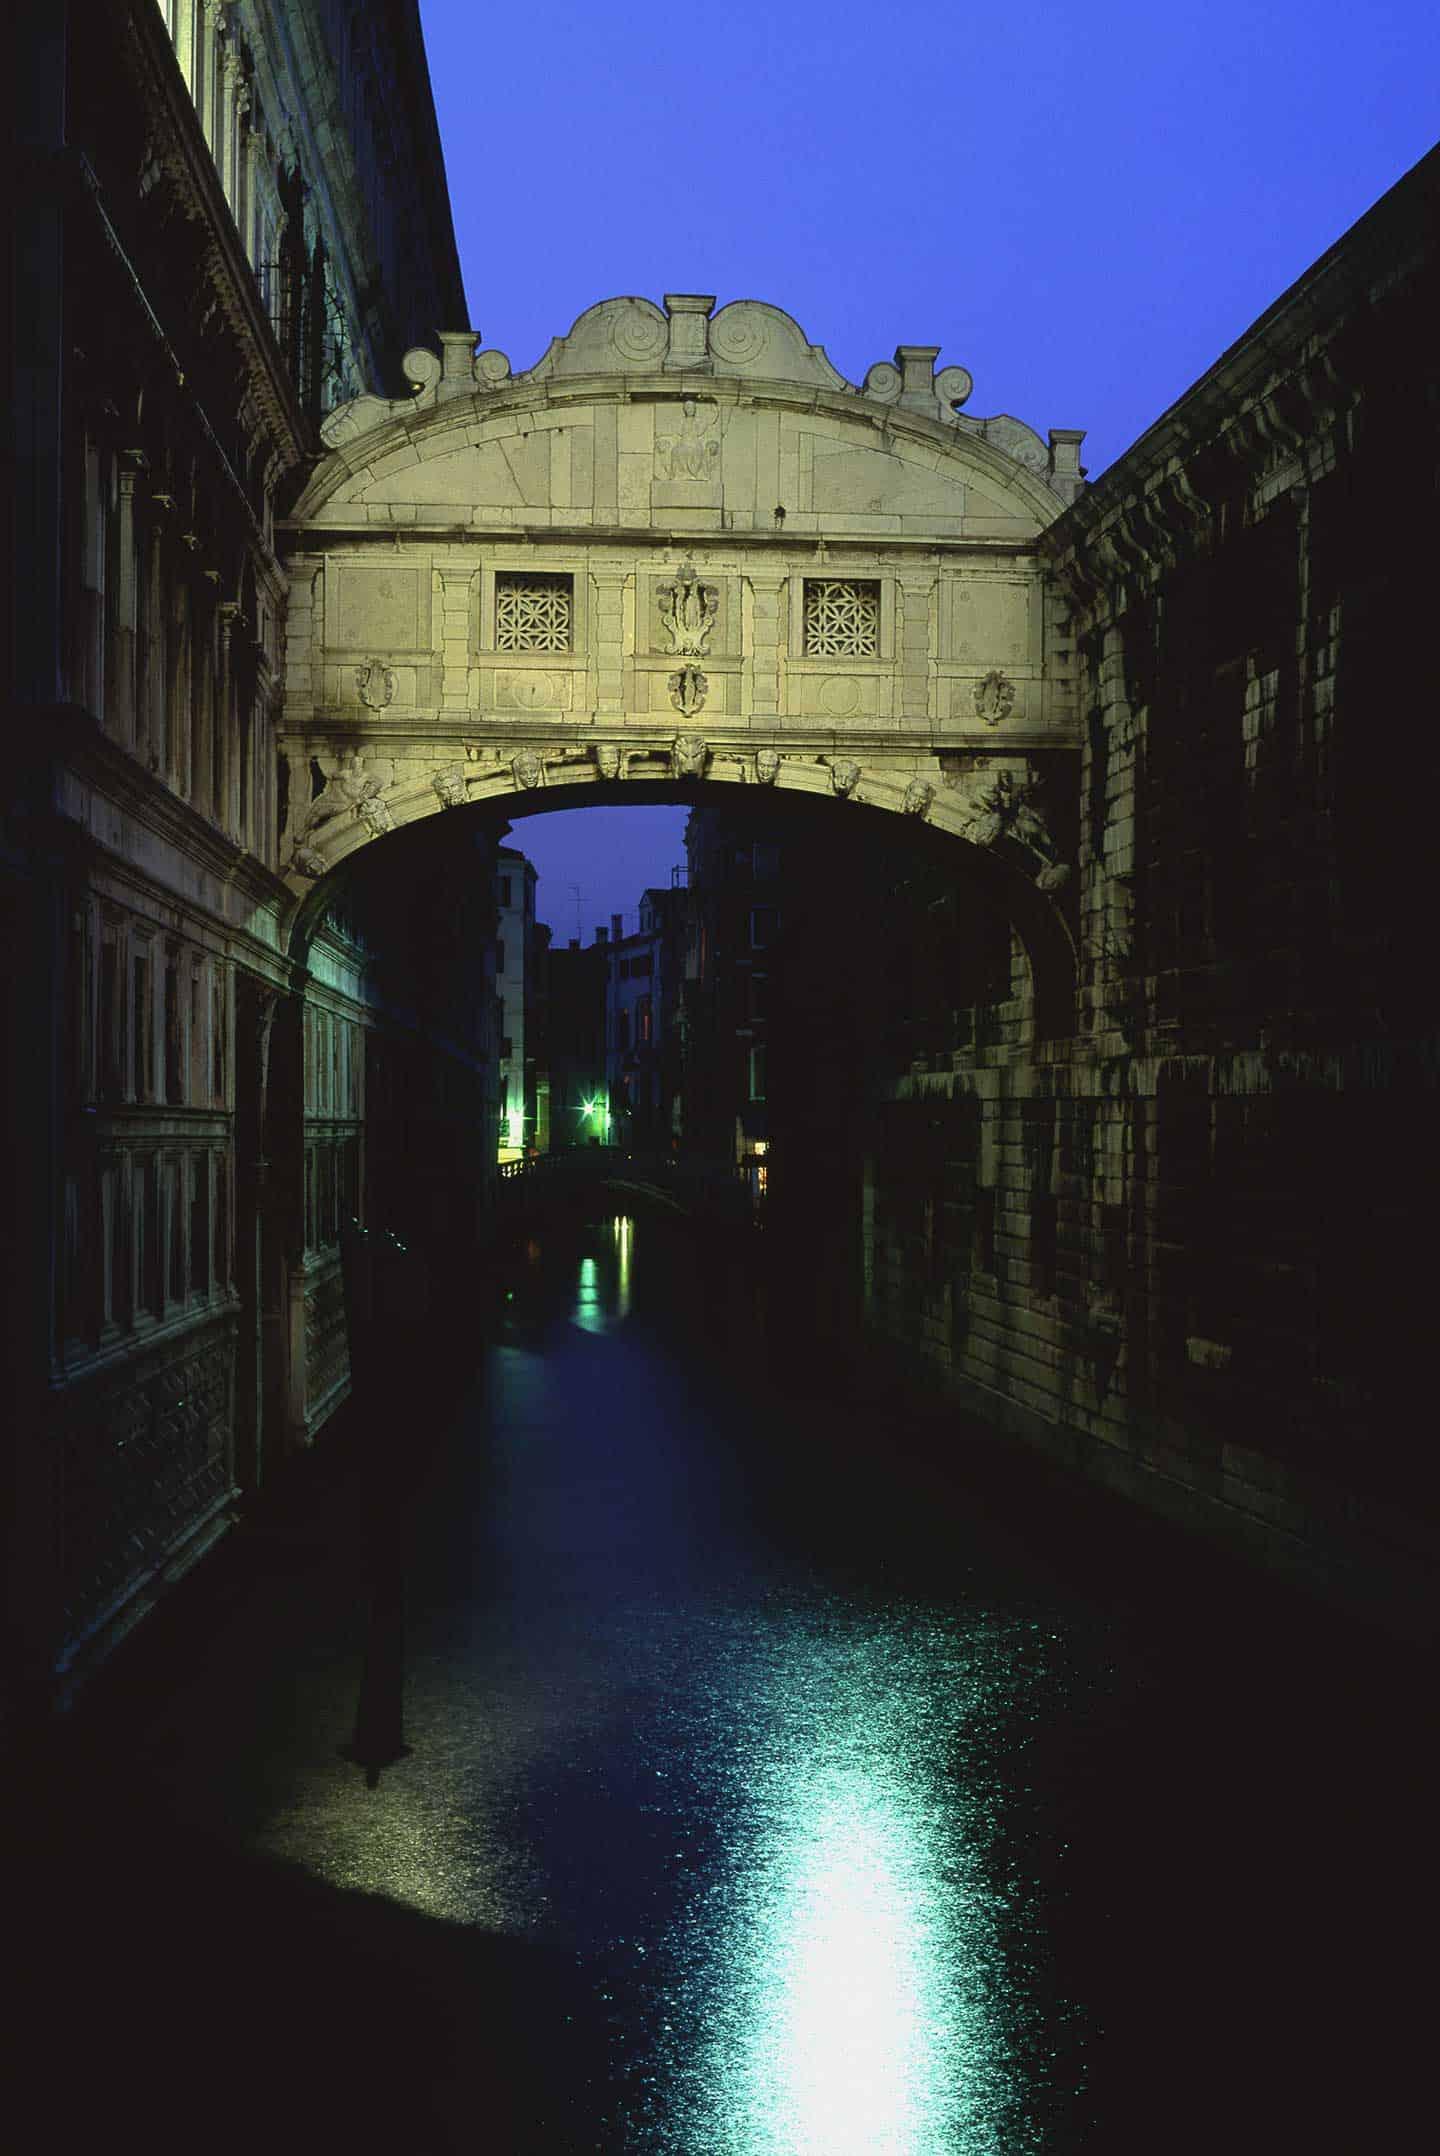 Image of the Bridge of Sighs Venice landmarl